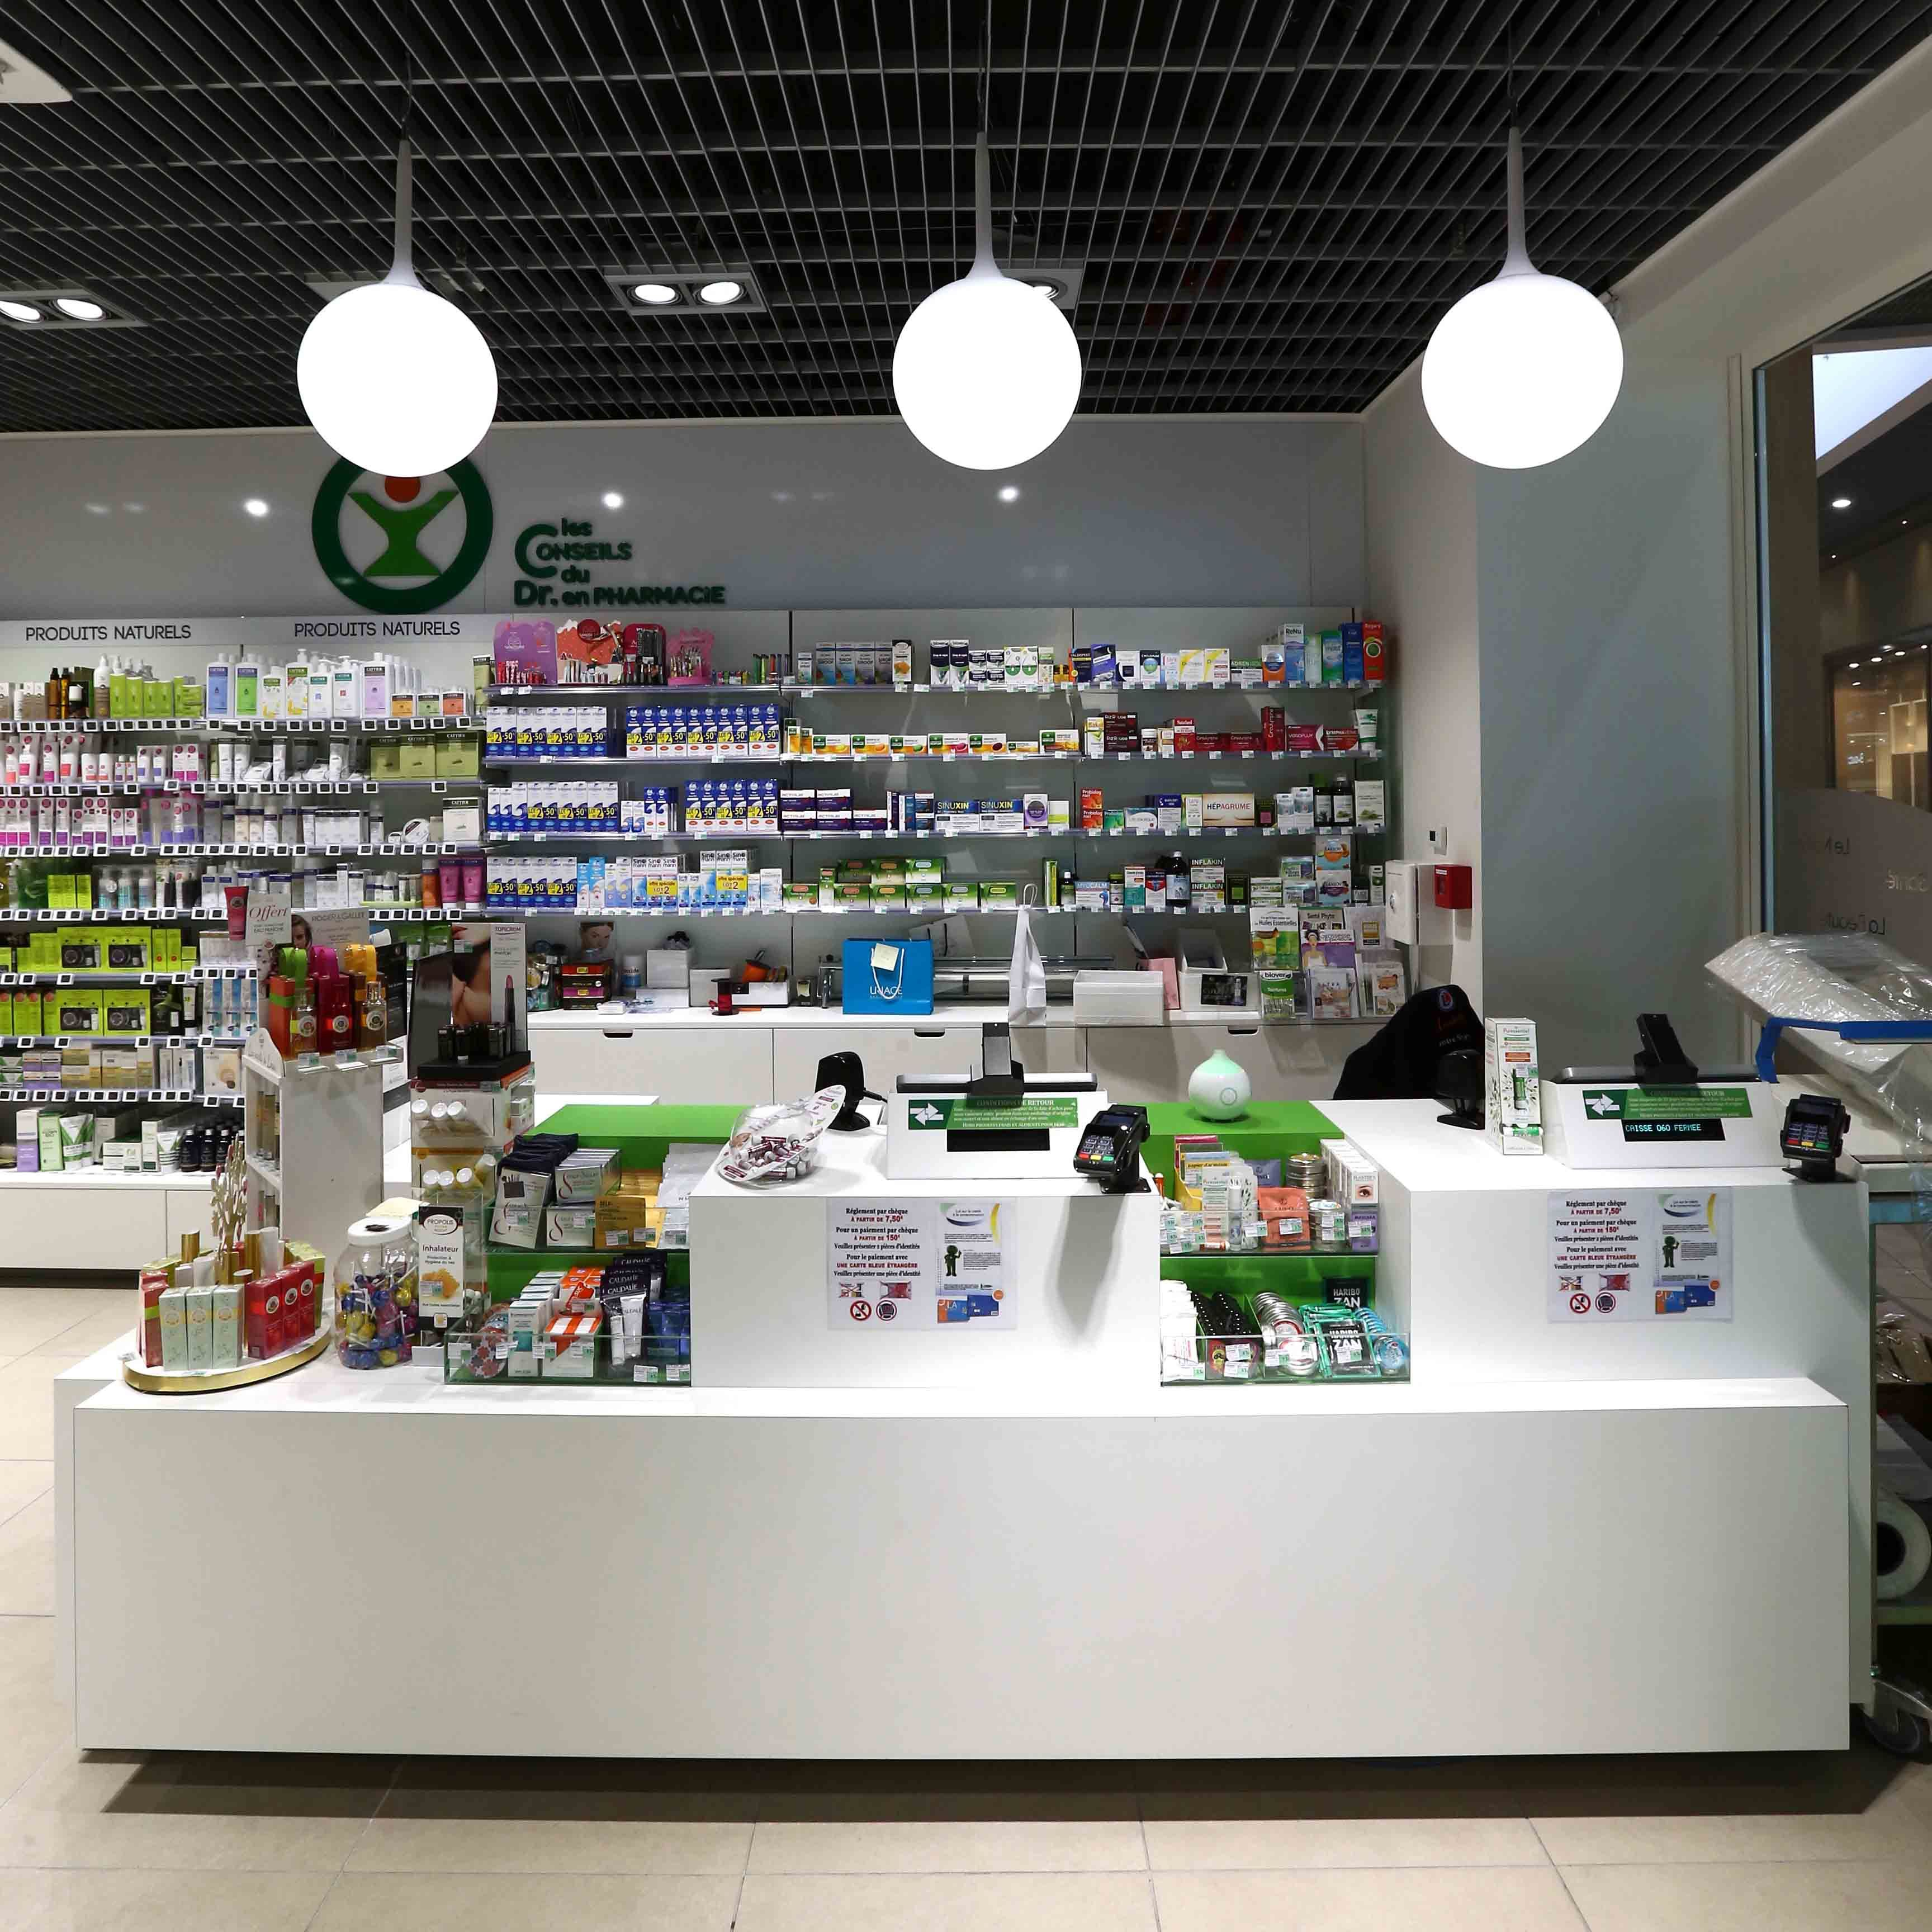 Agencement parapharmacie mobilier caisses mobilier sur for Agencement pharmacie meuble